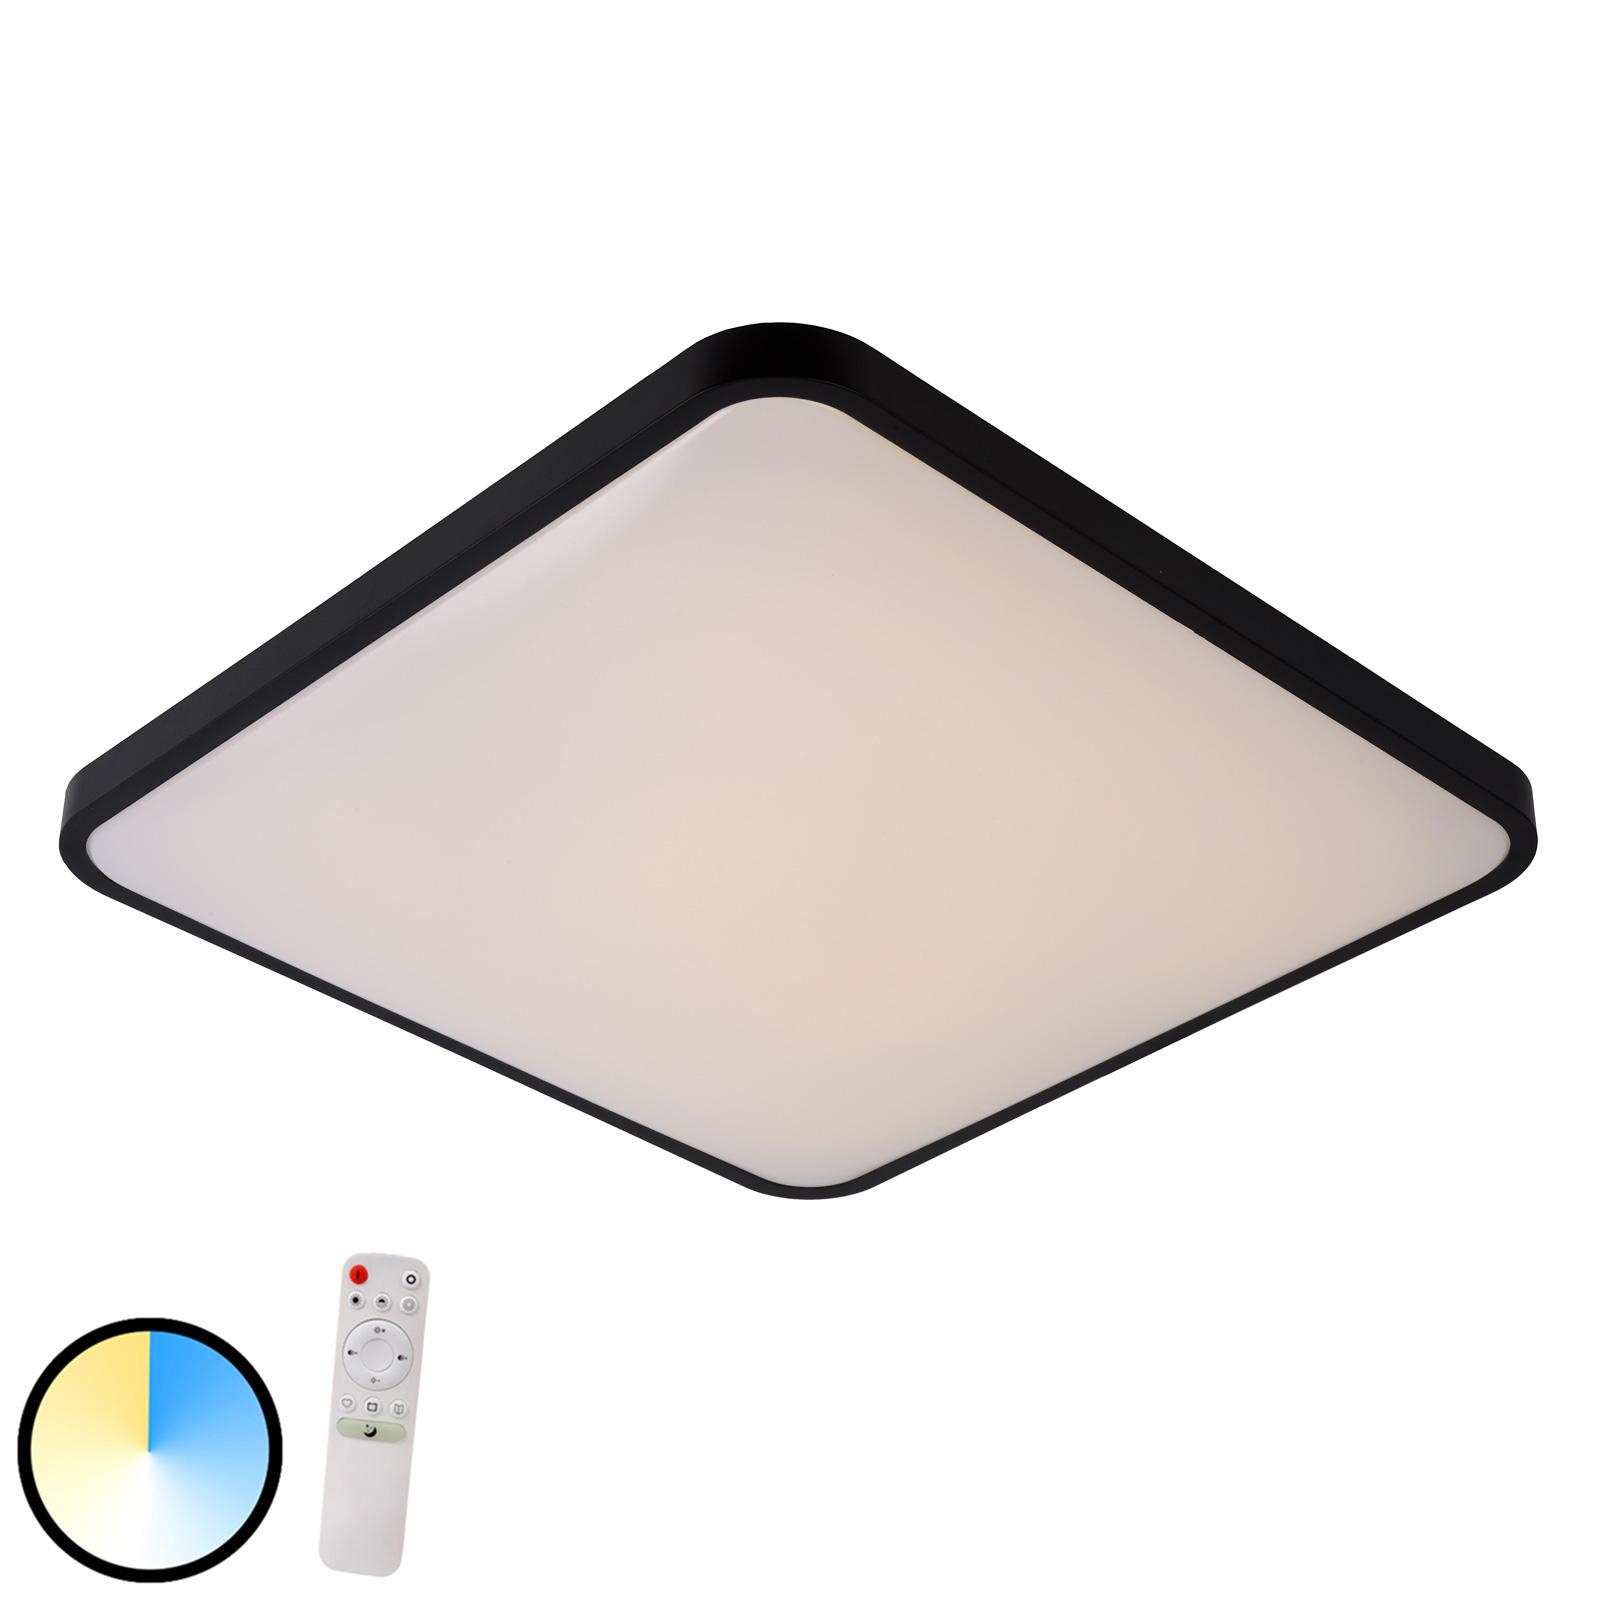 Lampa sufitowa LED Polaris 54 cm x 54 cm